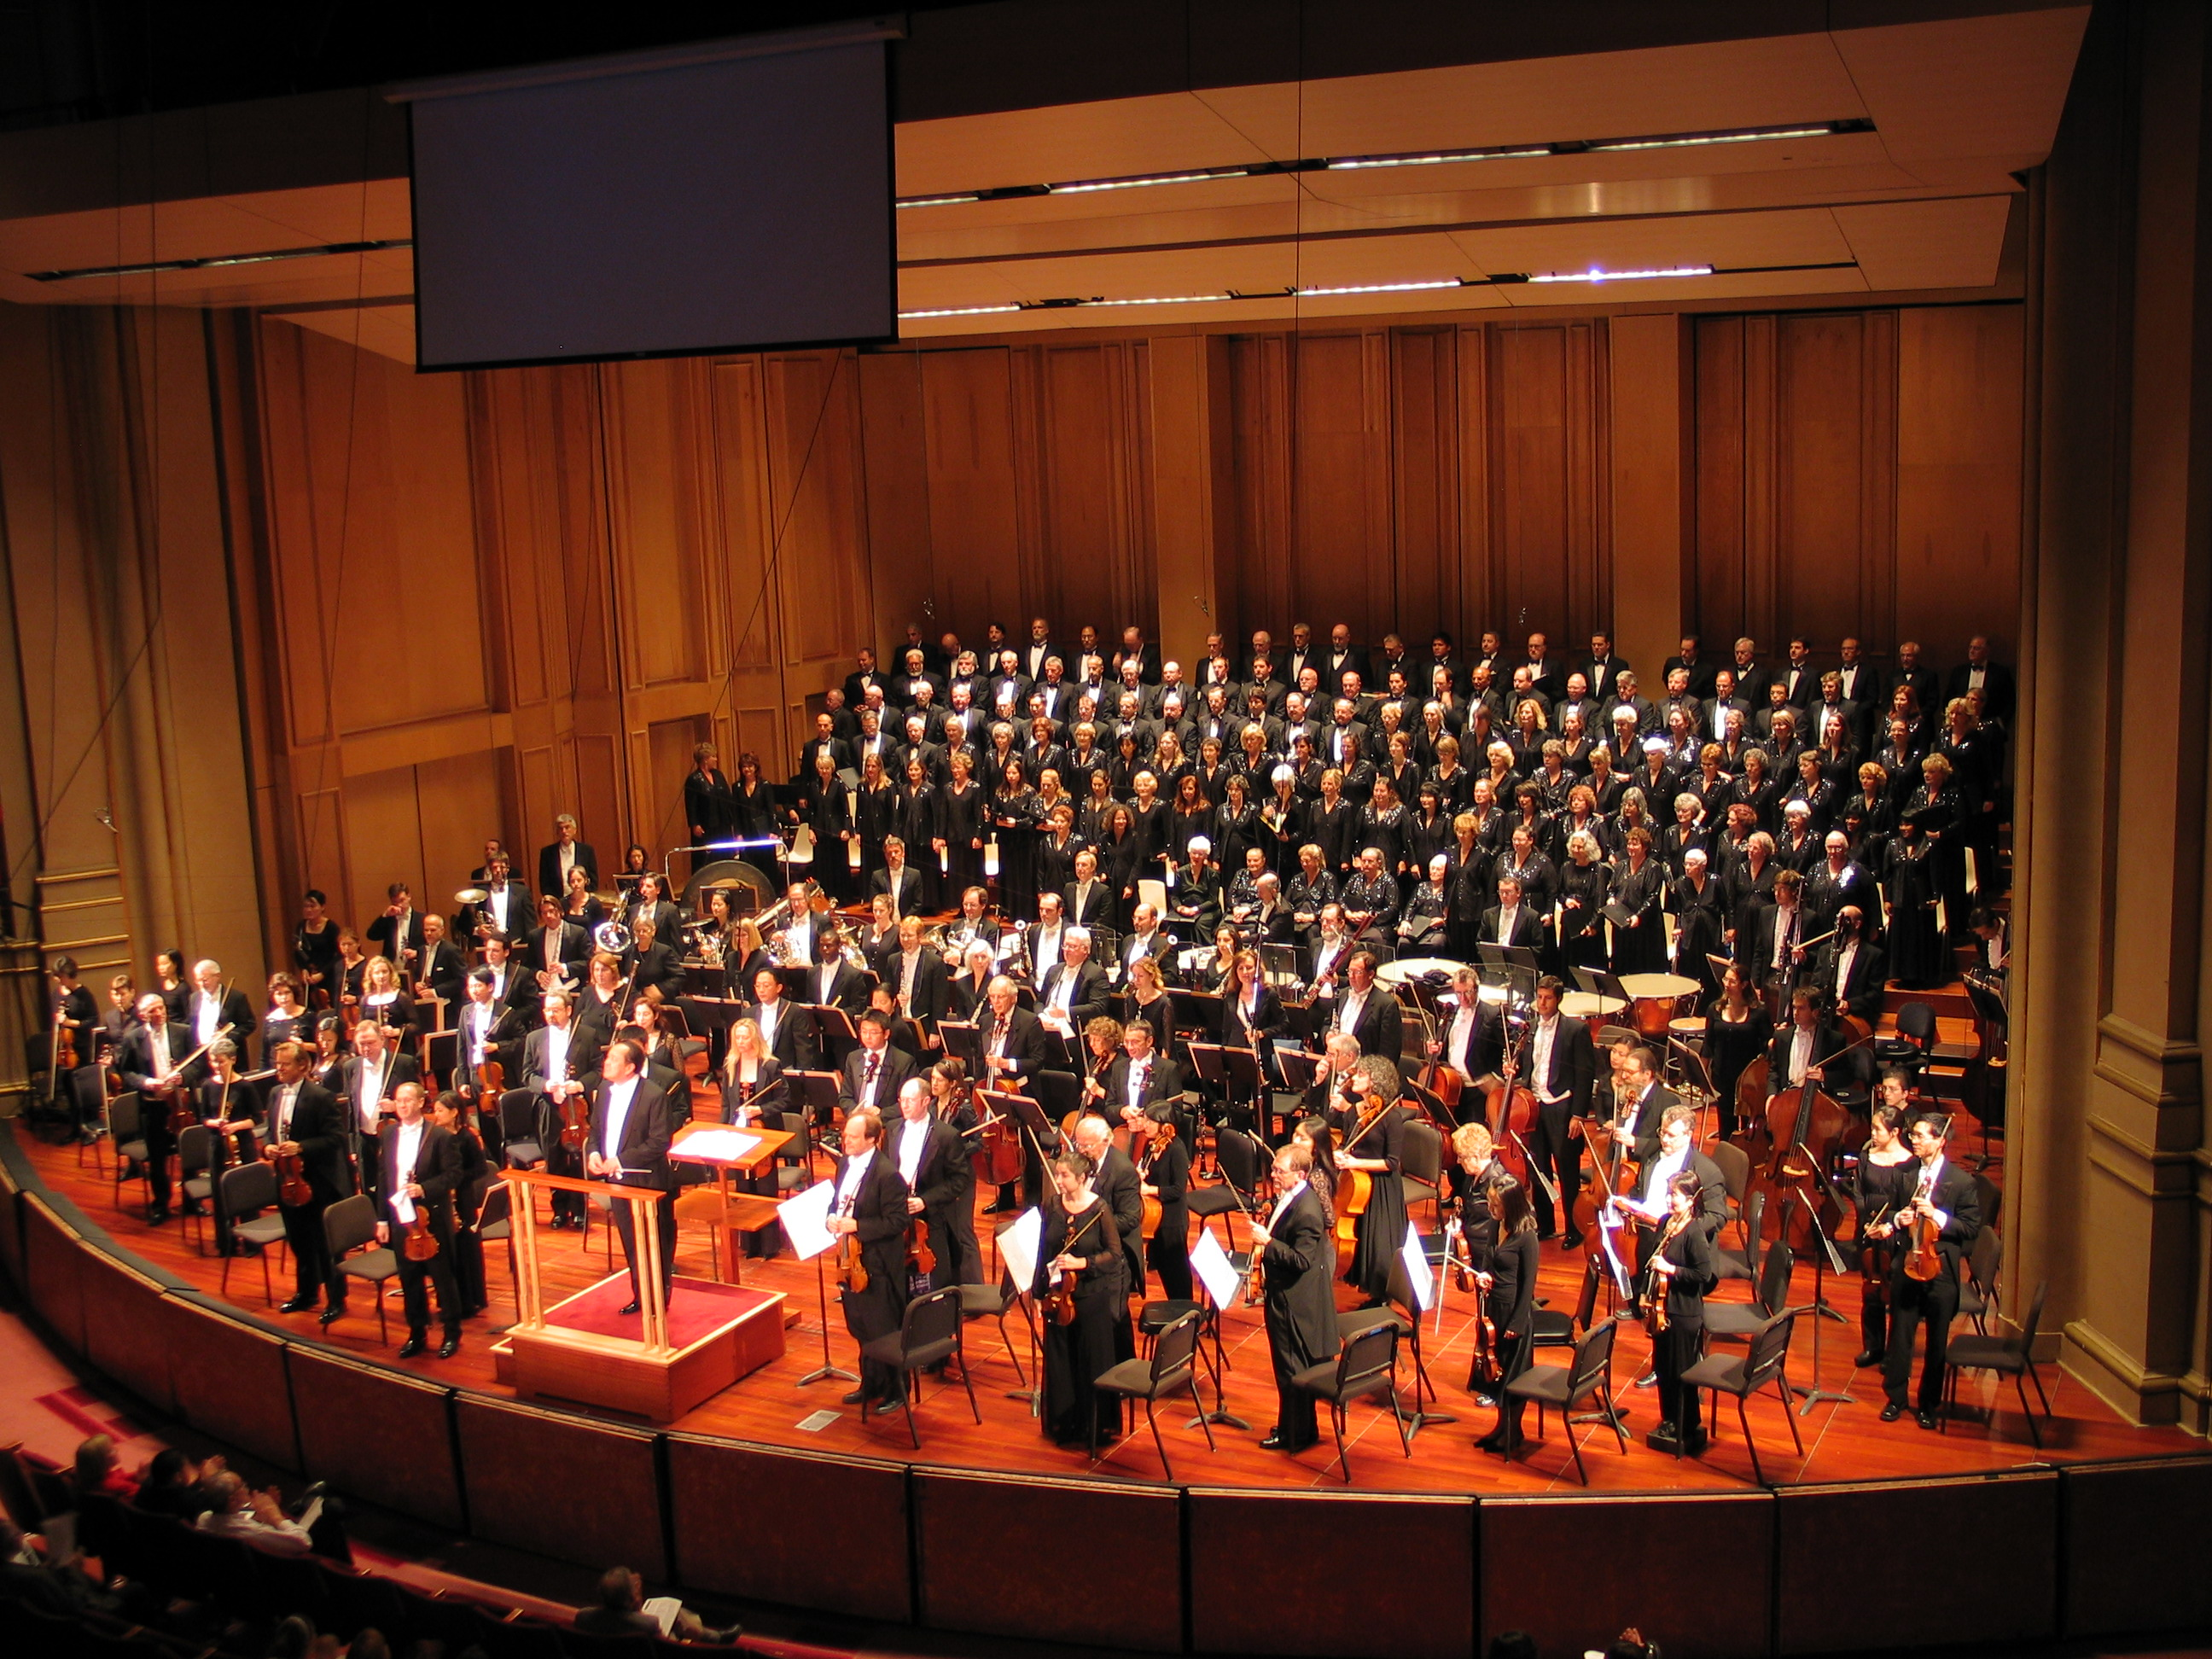 Dates San Diego Symphony Tour 2011